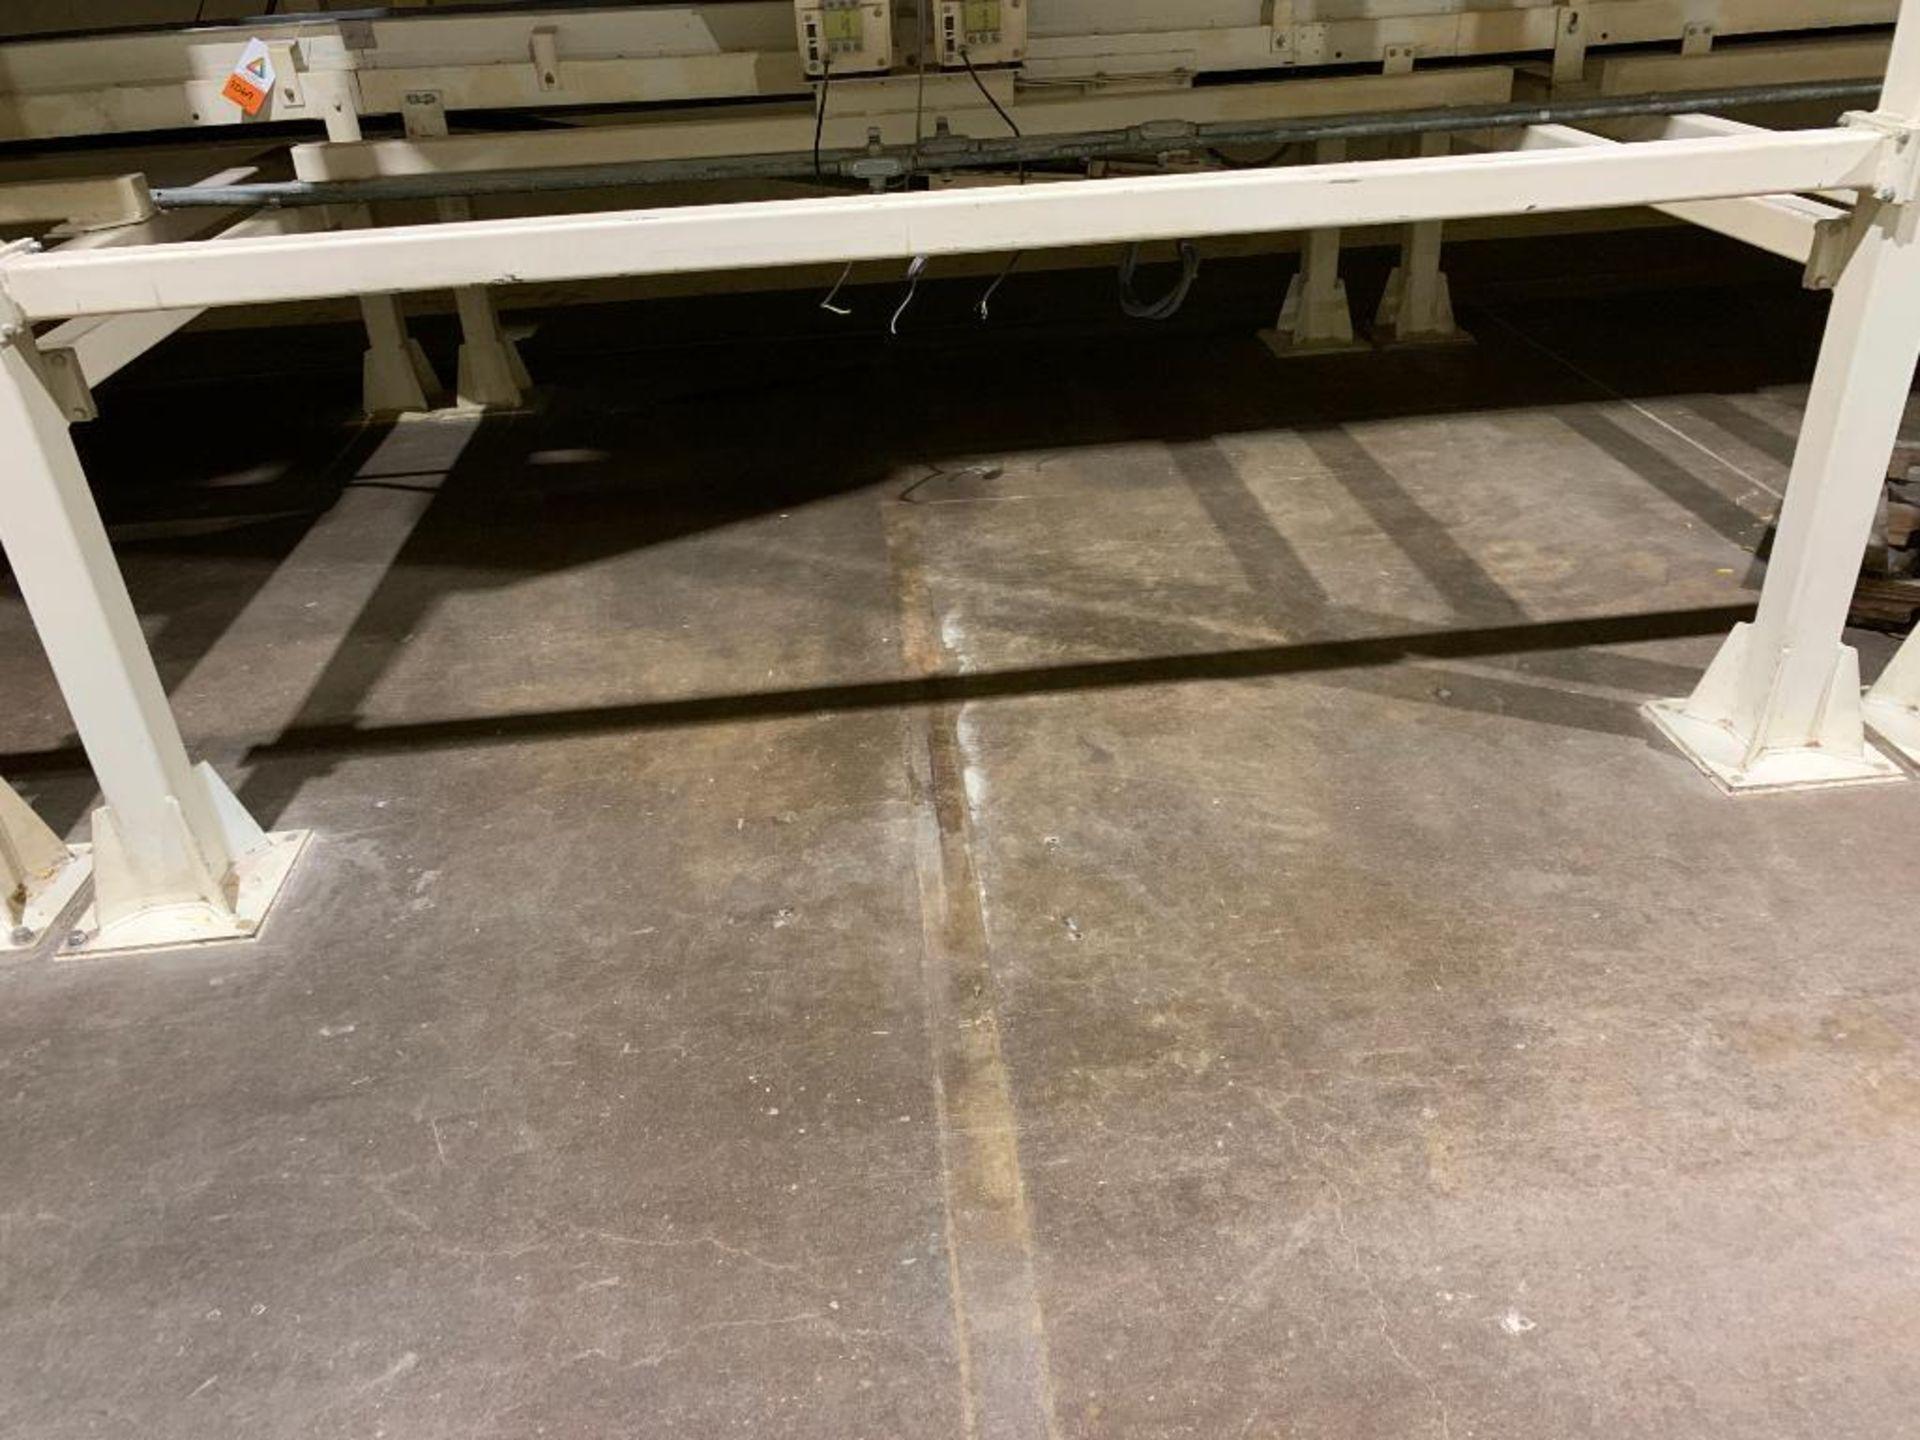 Aseeco mild steel cone bottom bulk storage bin - Image 3 of 27